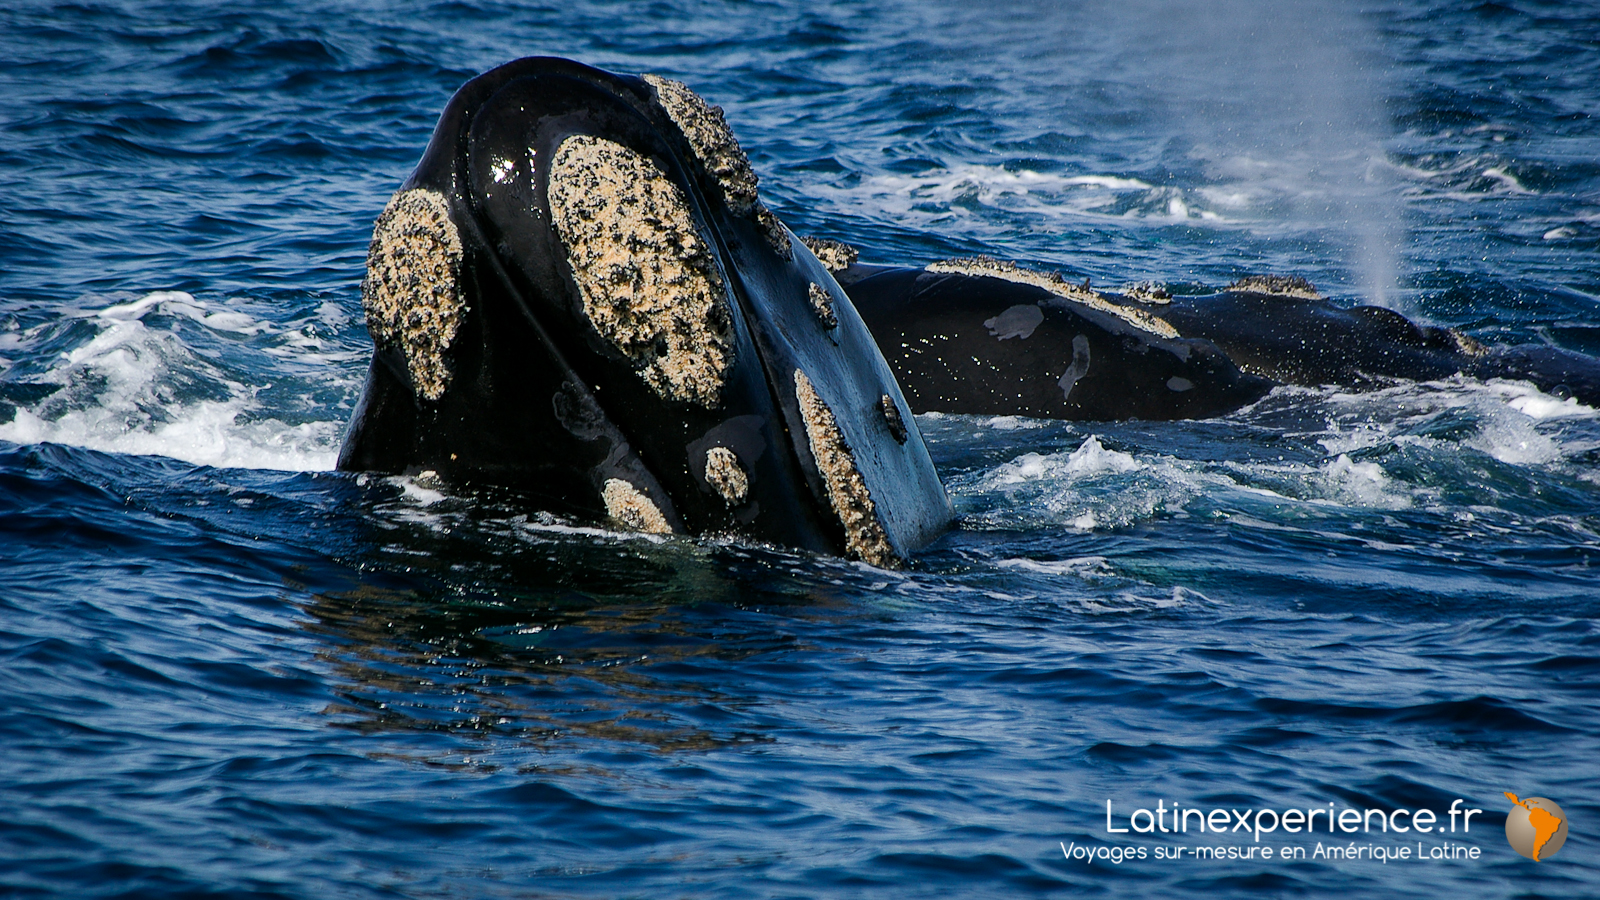 Argentine - Baleine - Péninsule de Valdes - Latinexperience voyages